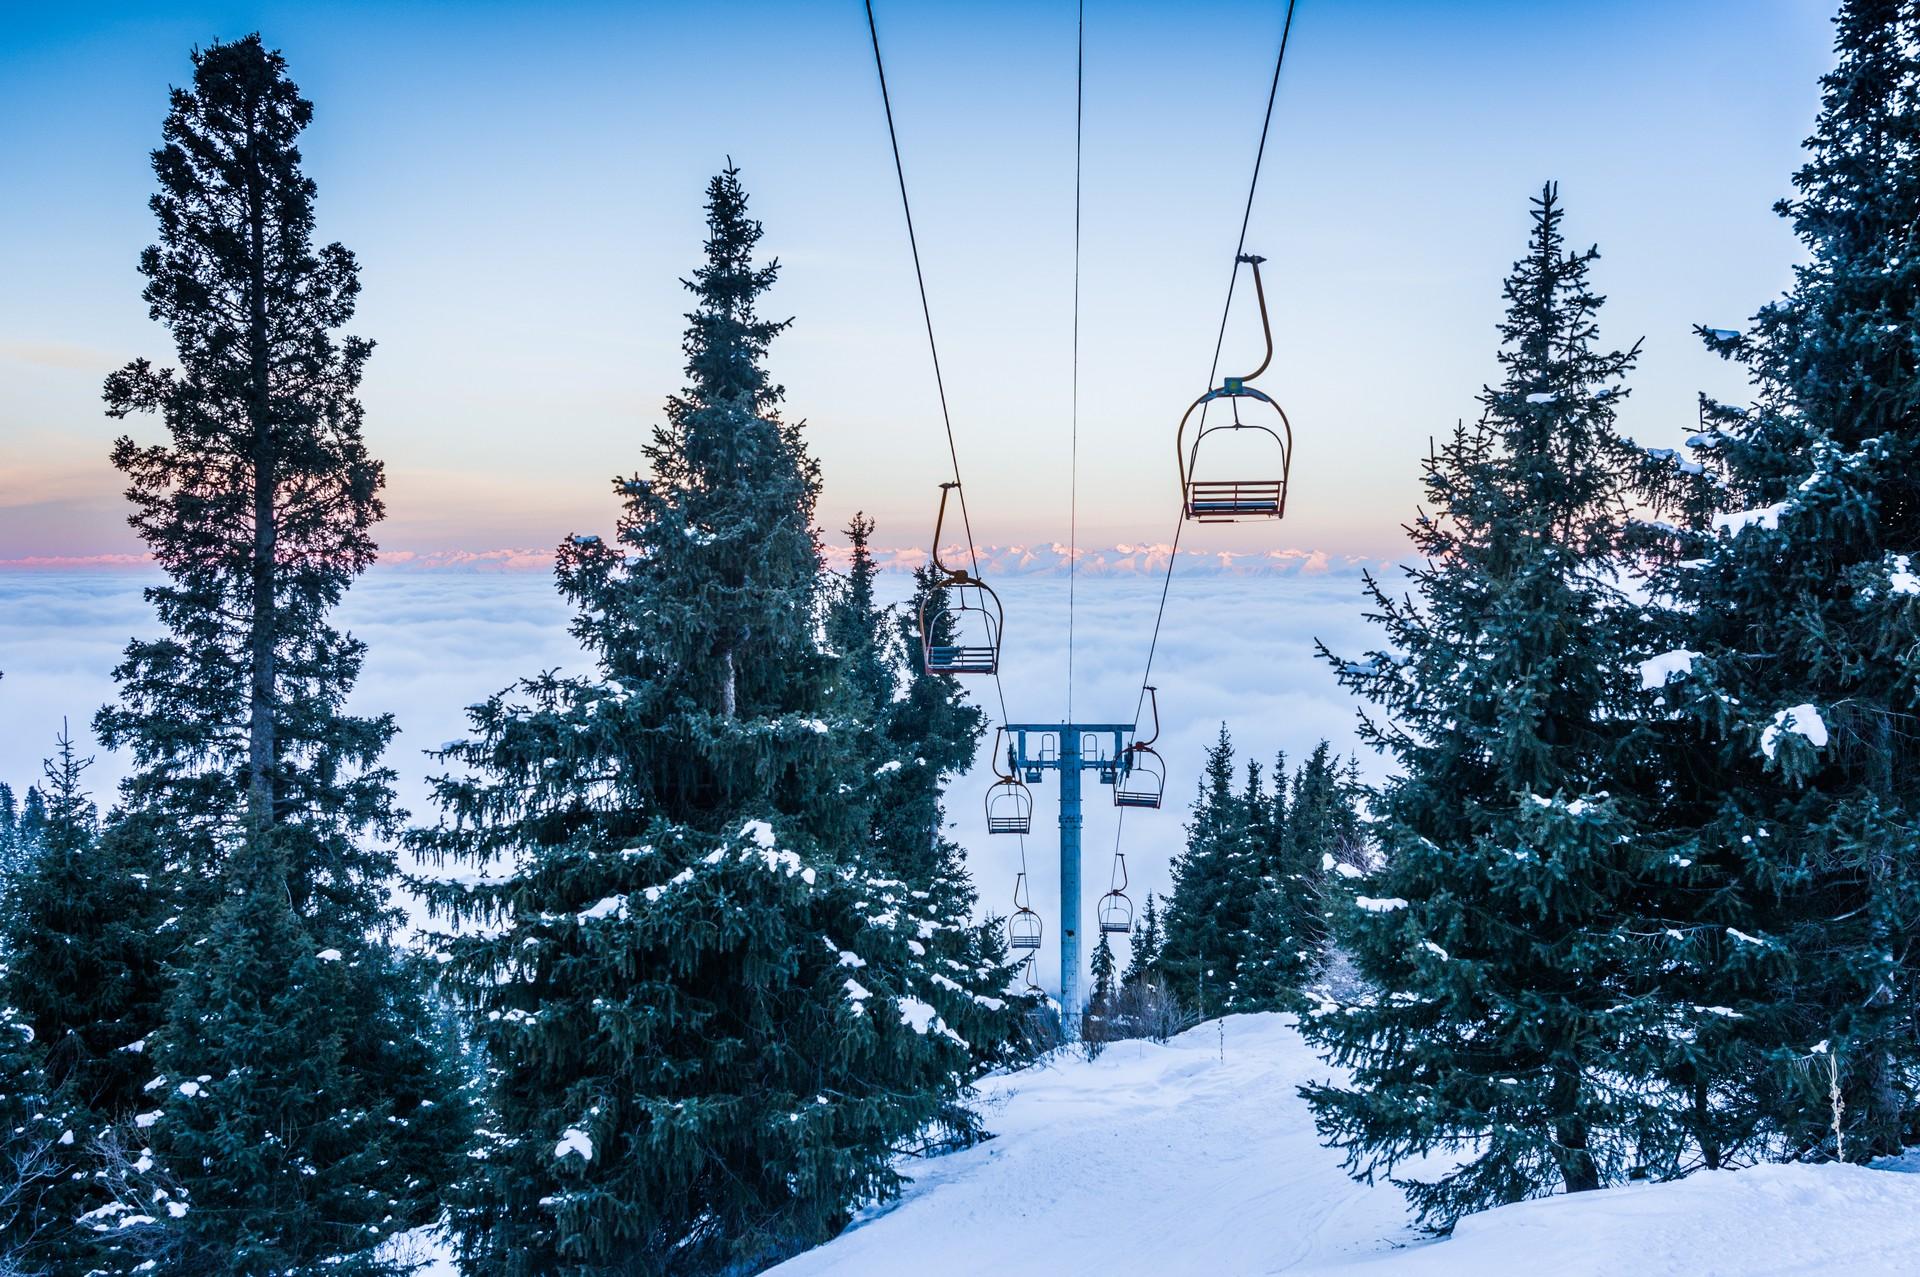 Ski lift in Kyrgyzstan